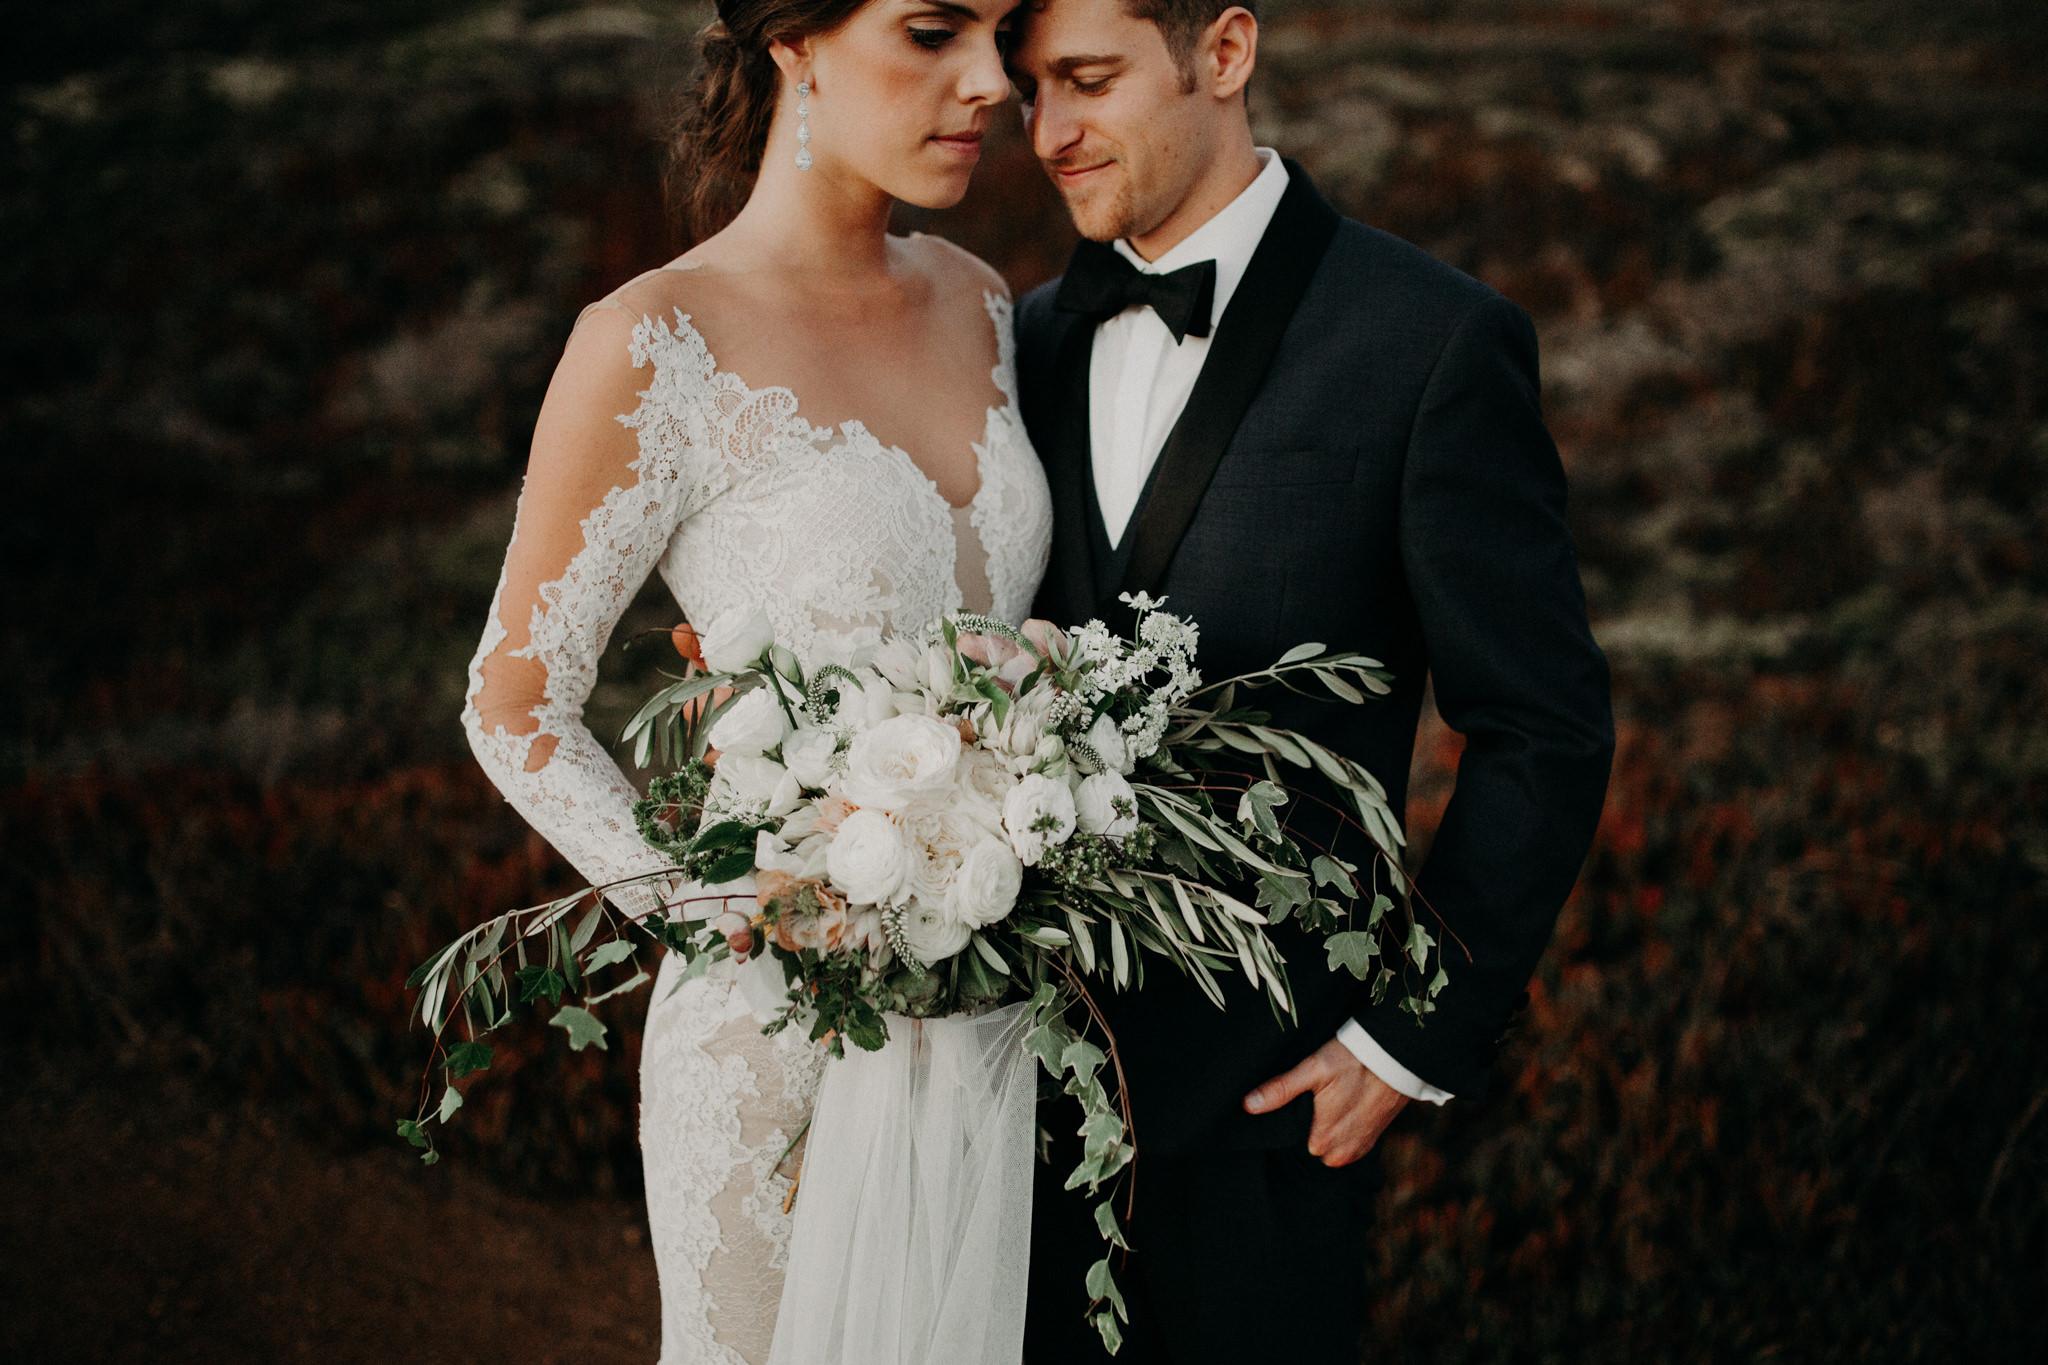 wedding-headlands-center-for-the-arts-sausalito-115.jpg